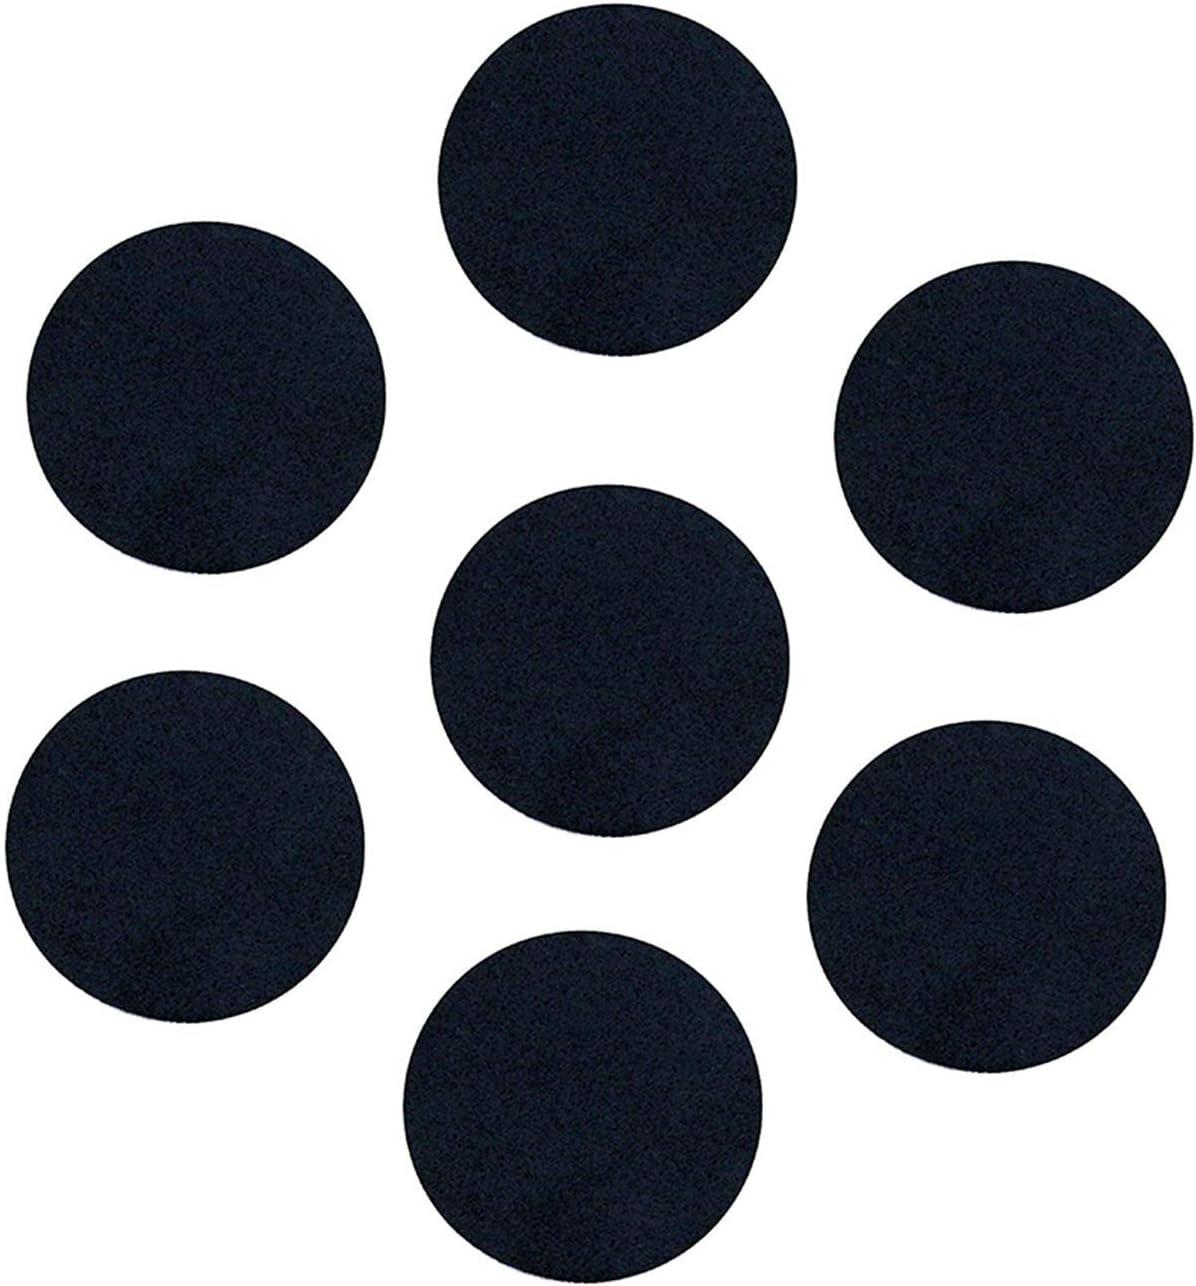 300 Pieces Black Adhesive Felt Circles Round Felt Pads DIY Circle Felt Self Adhesive Felt Pad for Halloween DIY Craft Projects Costume Decor 1//2 Inch, 1 Inch, 1.5 Inch